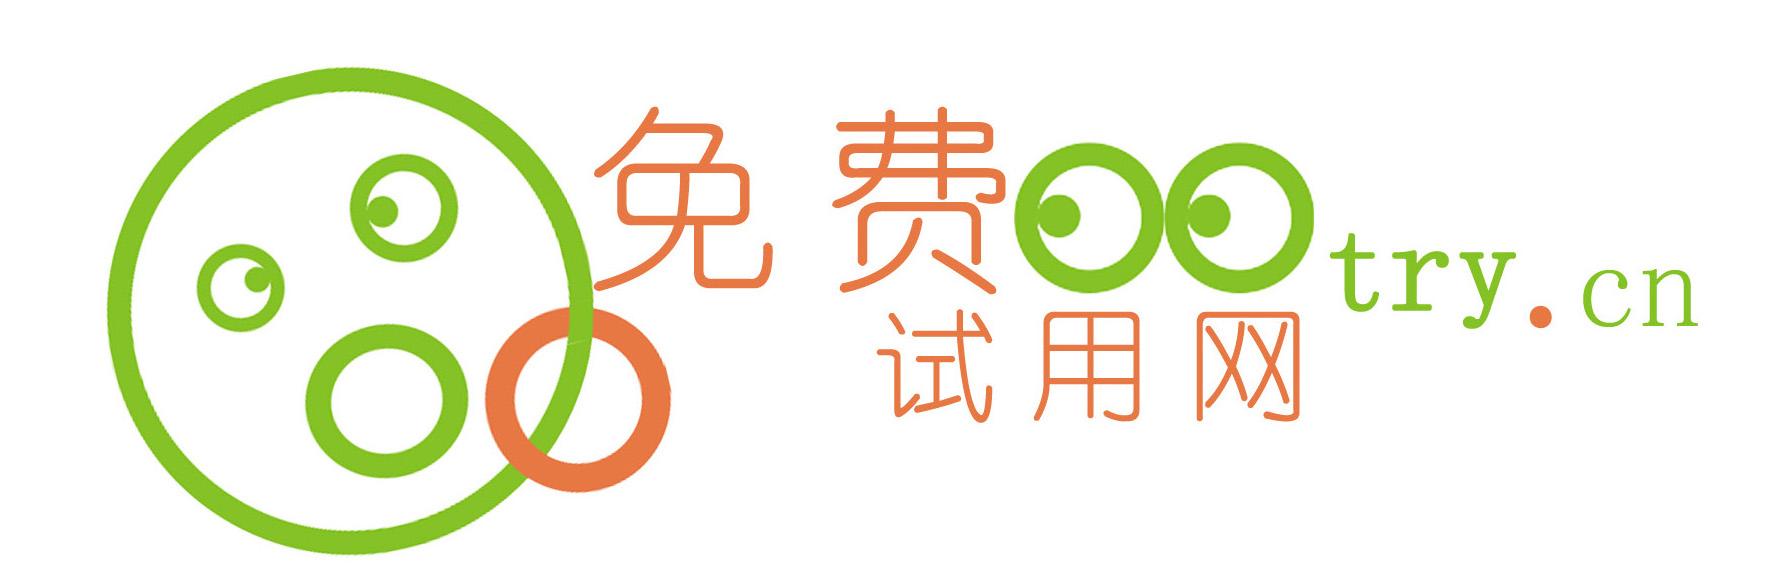 logo设计.免费试用网ootry.cn